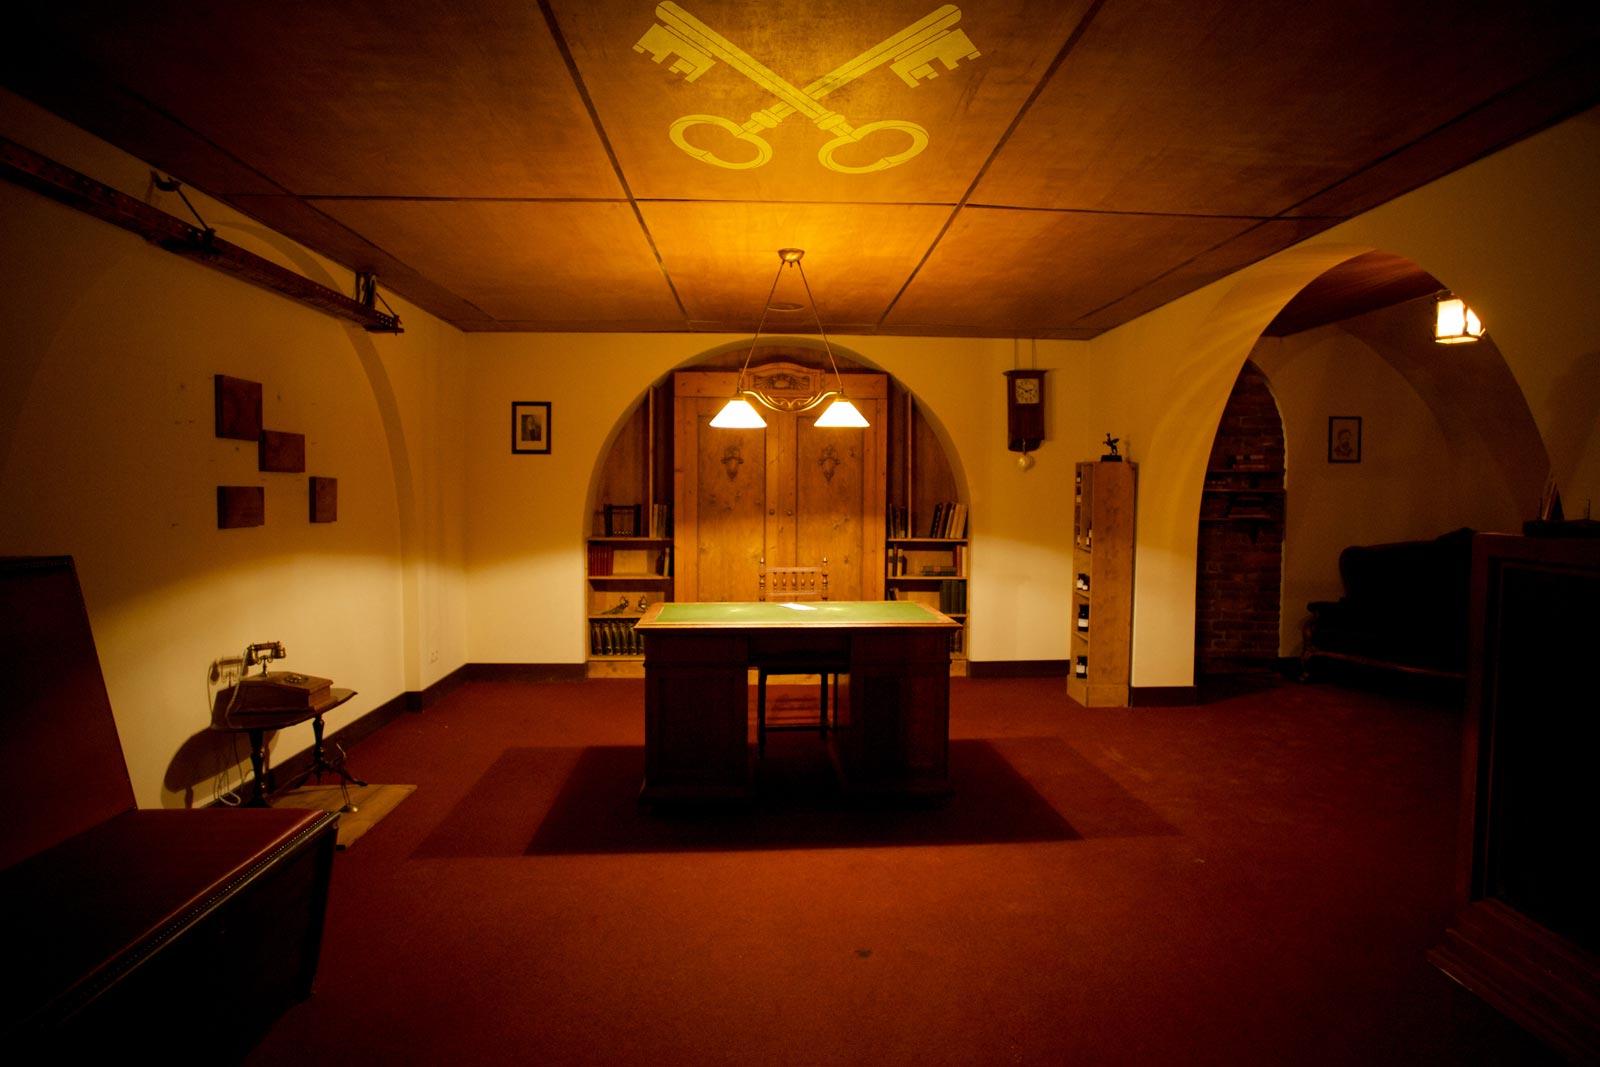 Captive Escape Rooms